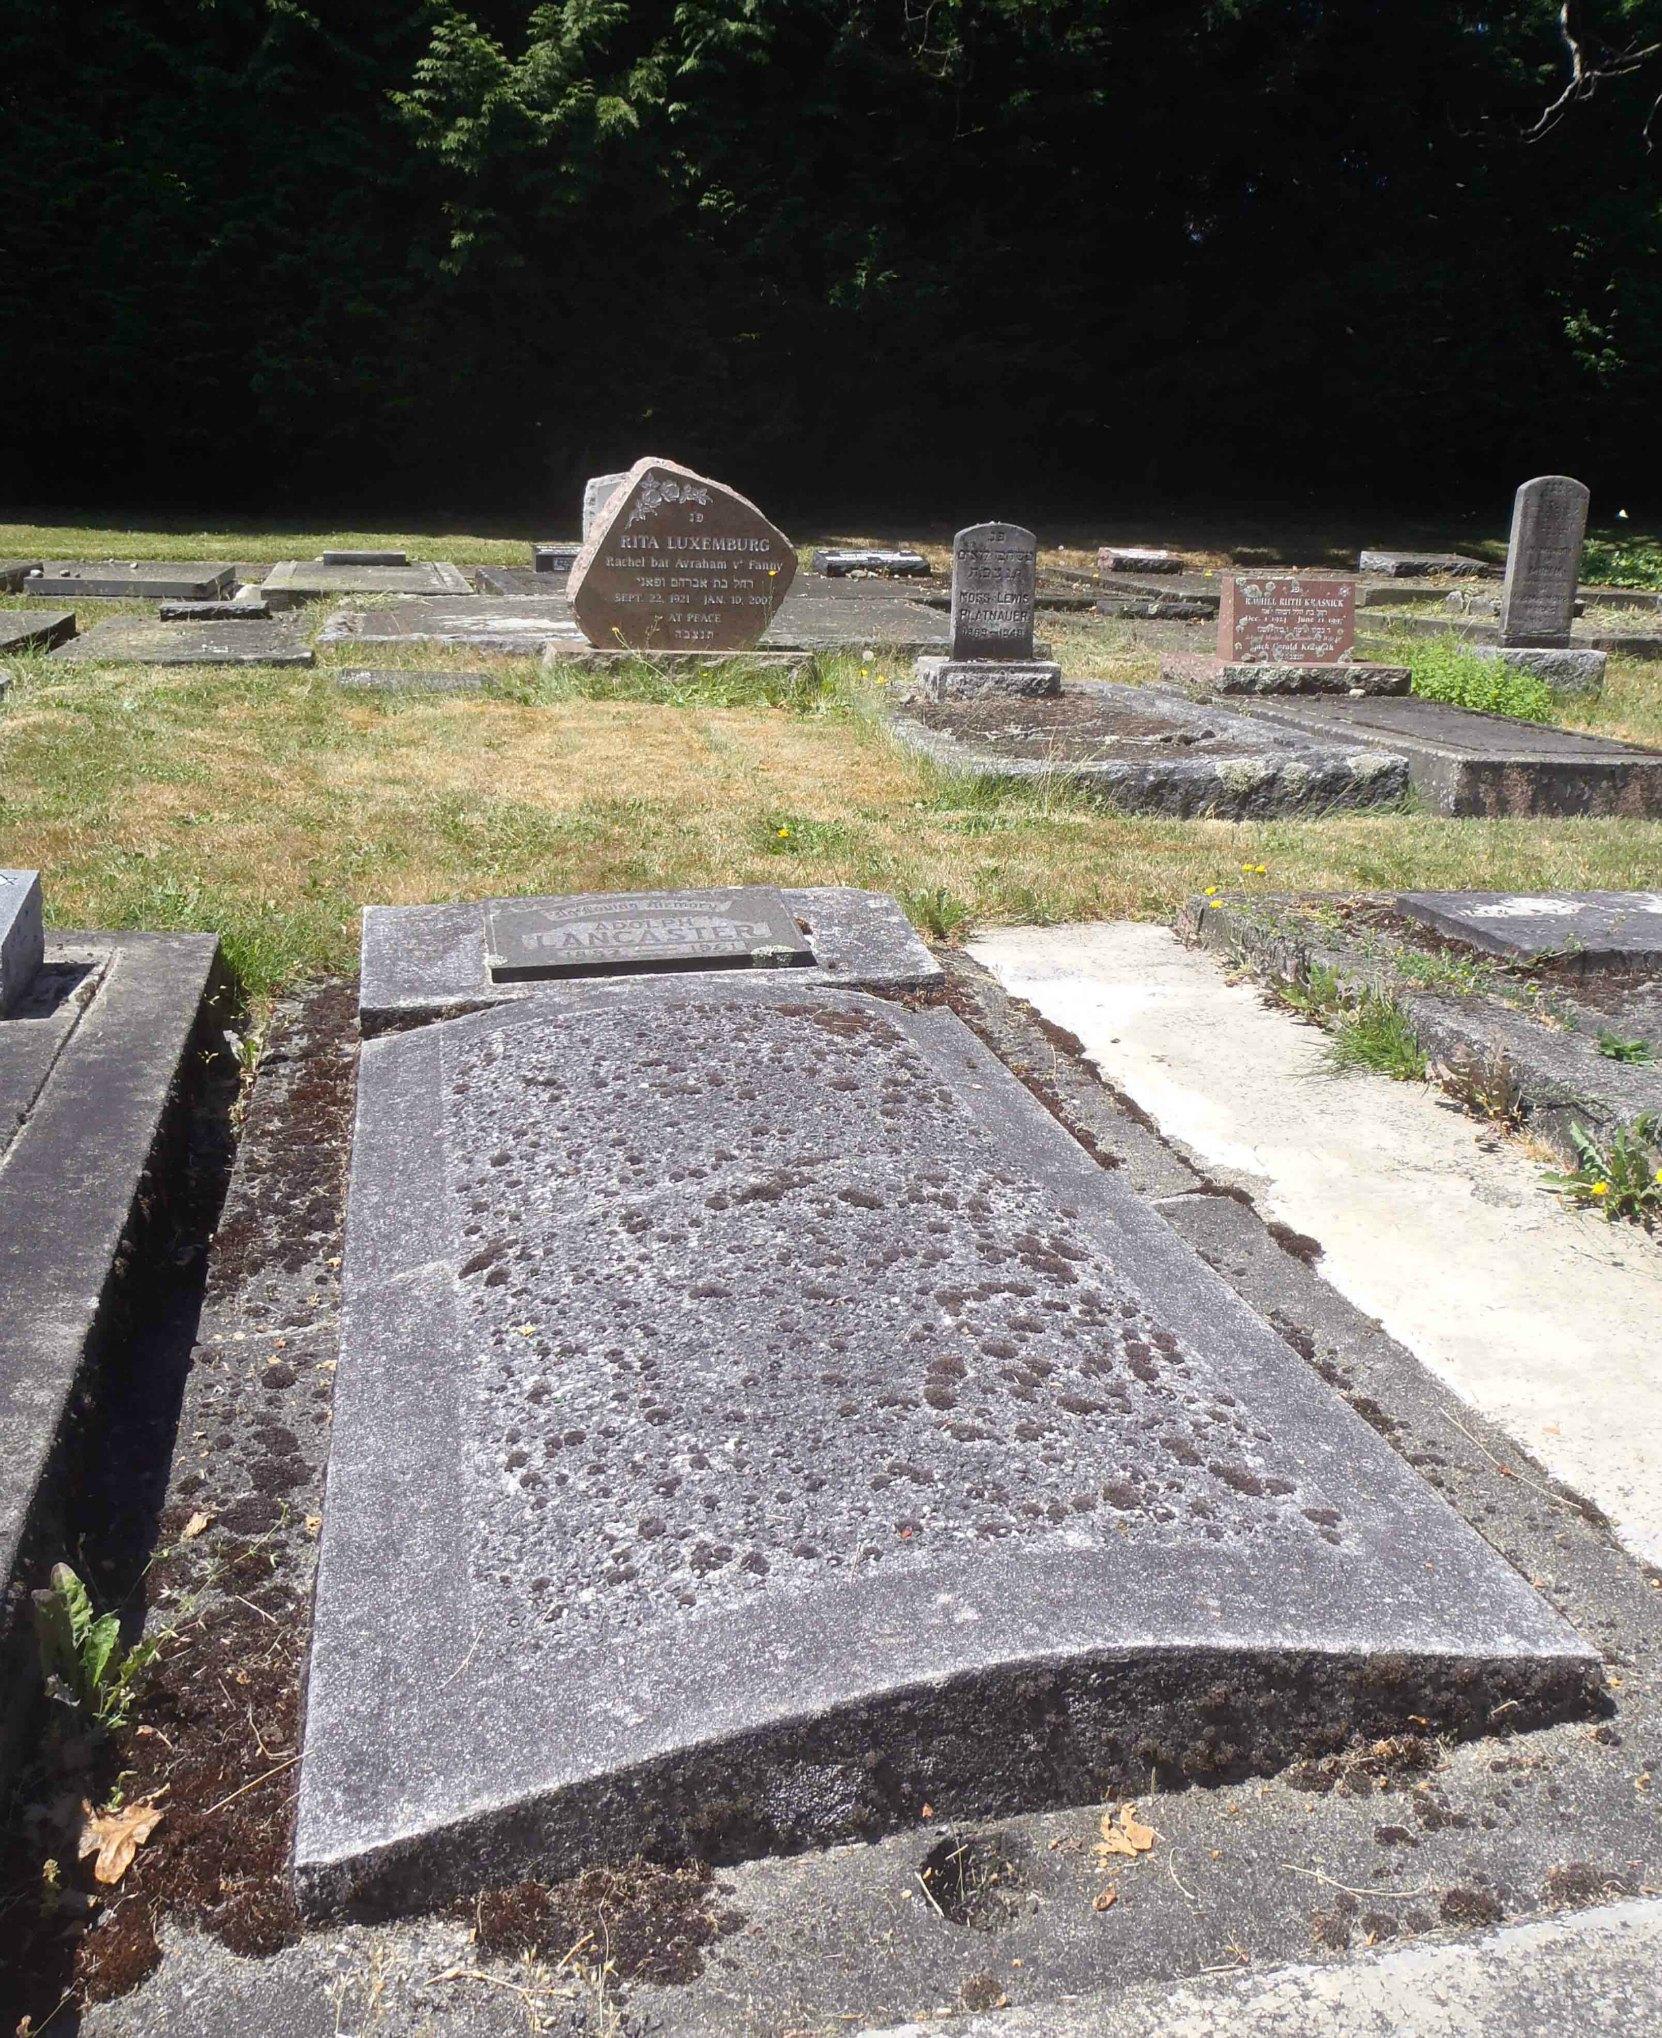 Adolph Lancaster (1882-1861), grave, Victoria Jewish Cemetery, Victoria, B.C.